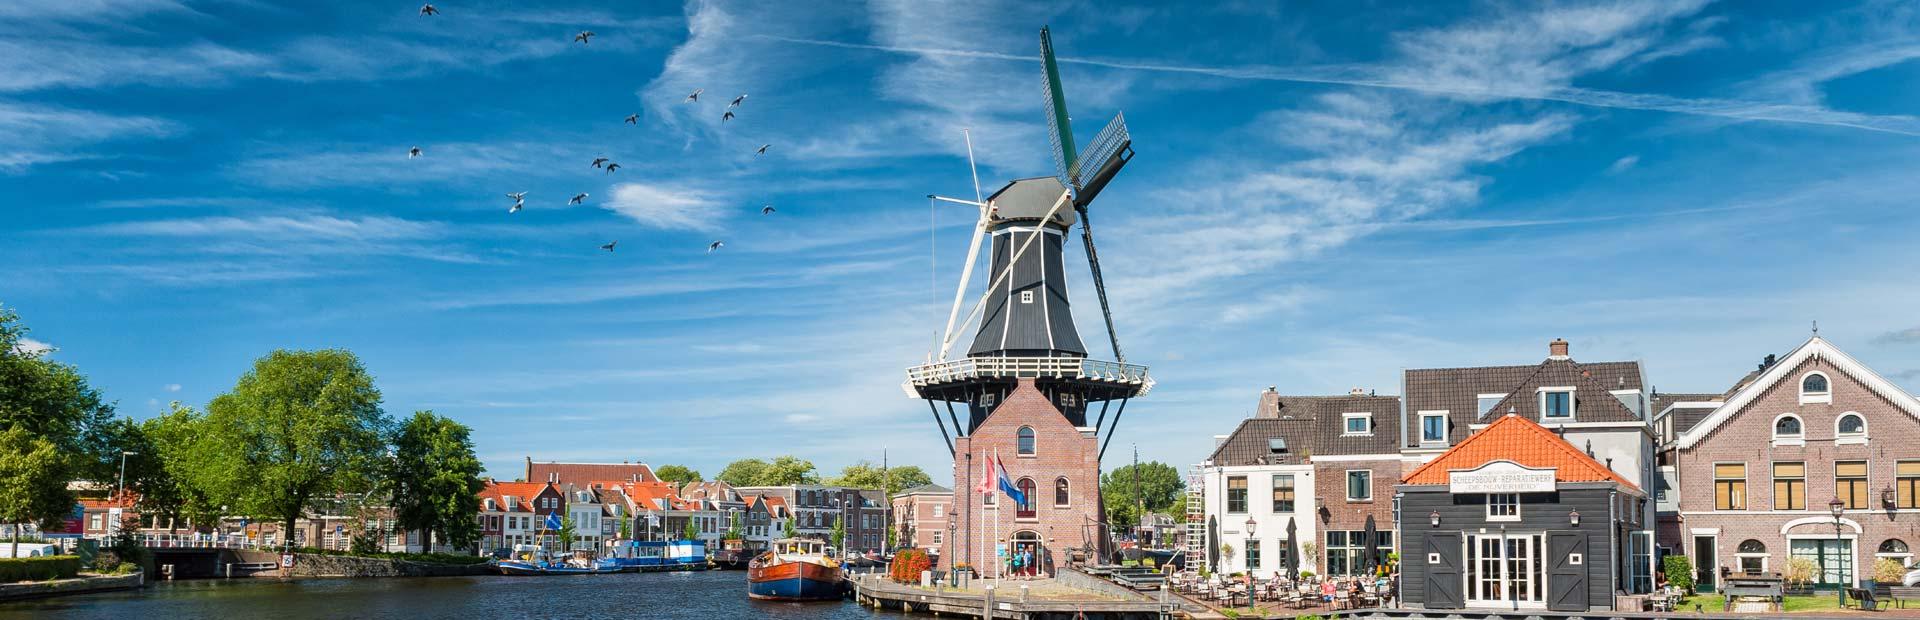 Dutch Waterways and windmill